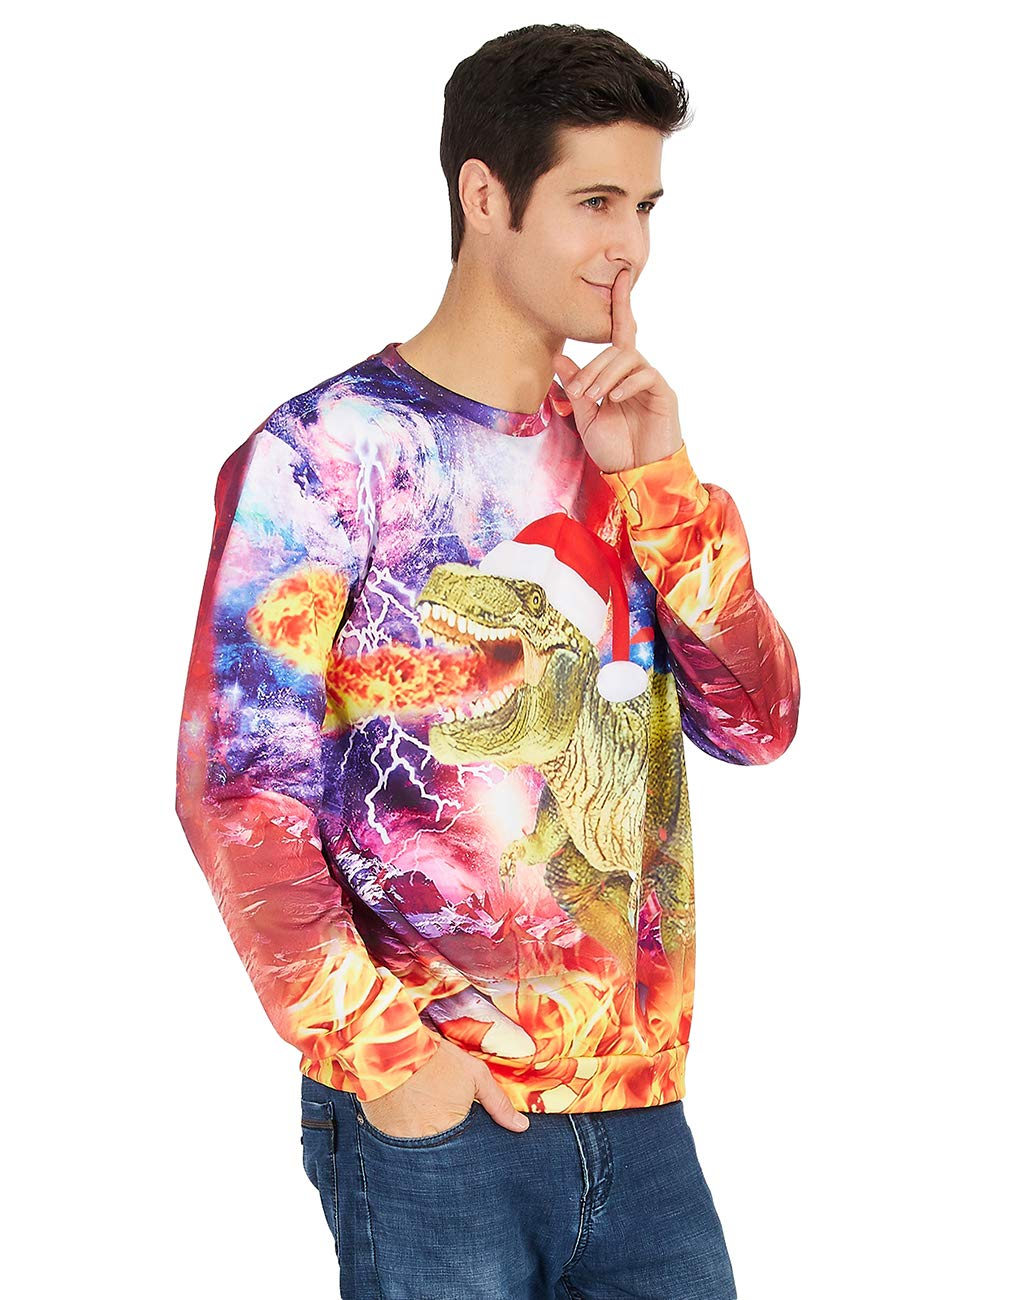 RAISEVERN Unisex Funny Dragon Print Ugly Christmas Sweater Crewneck Sweatshirt Long Sleeved XXL Dinosaur Green